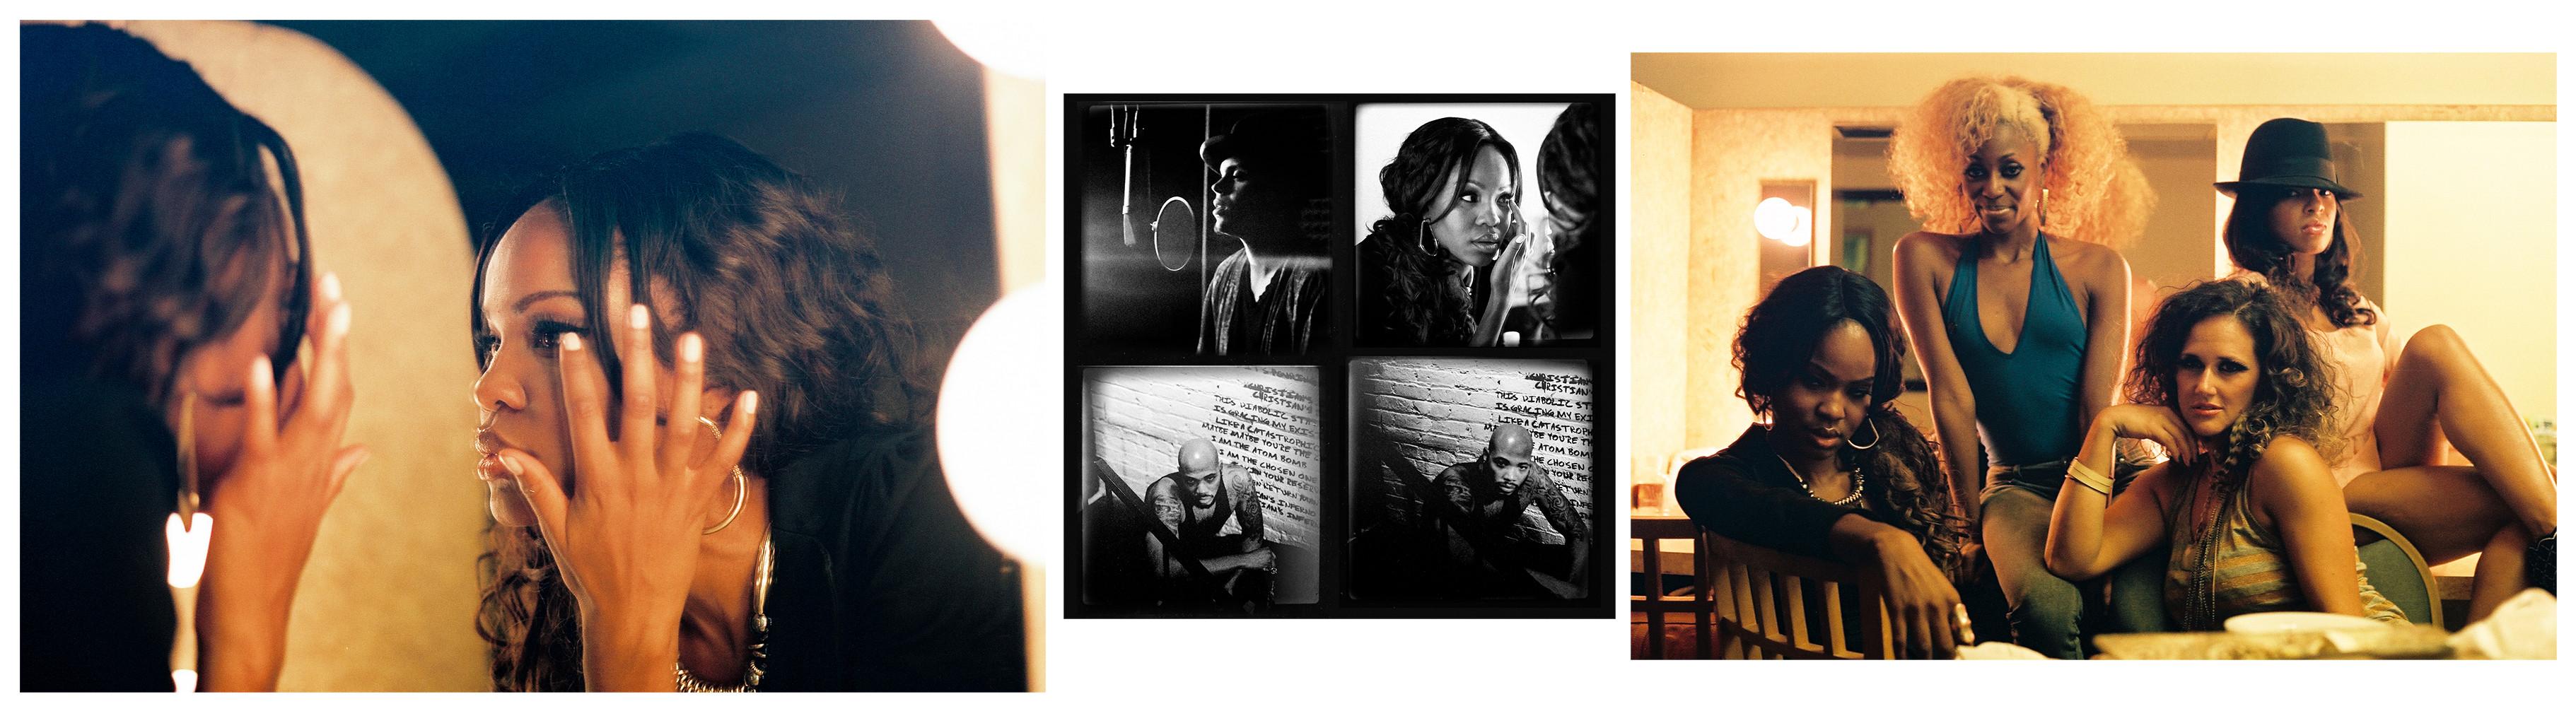 Event Collage-2.jpg